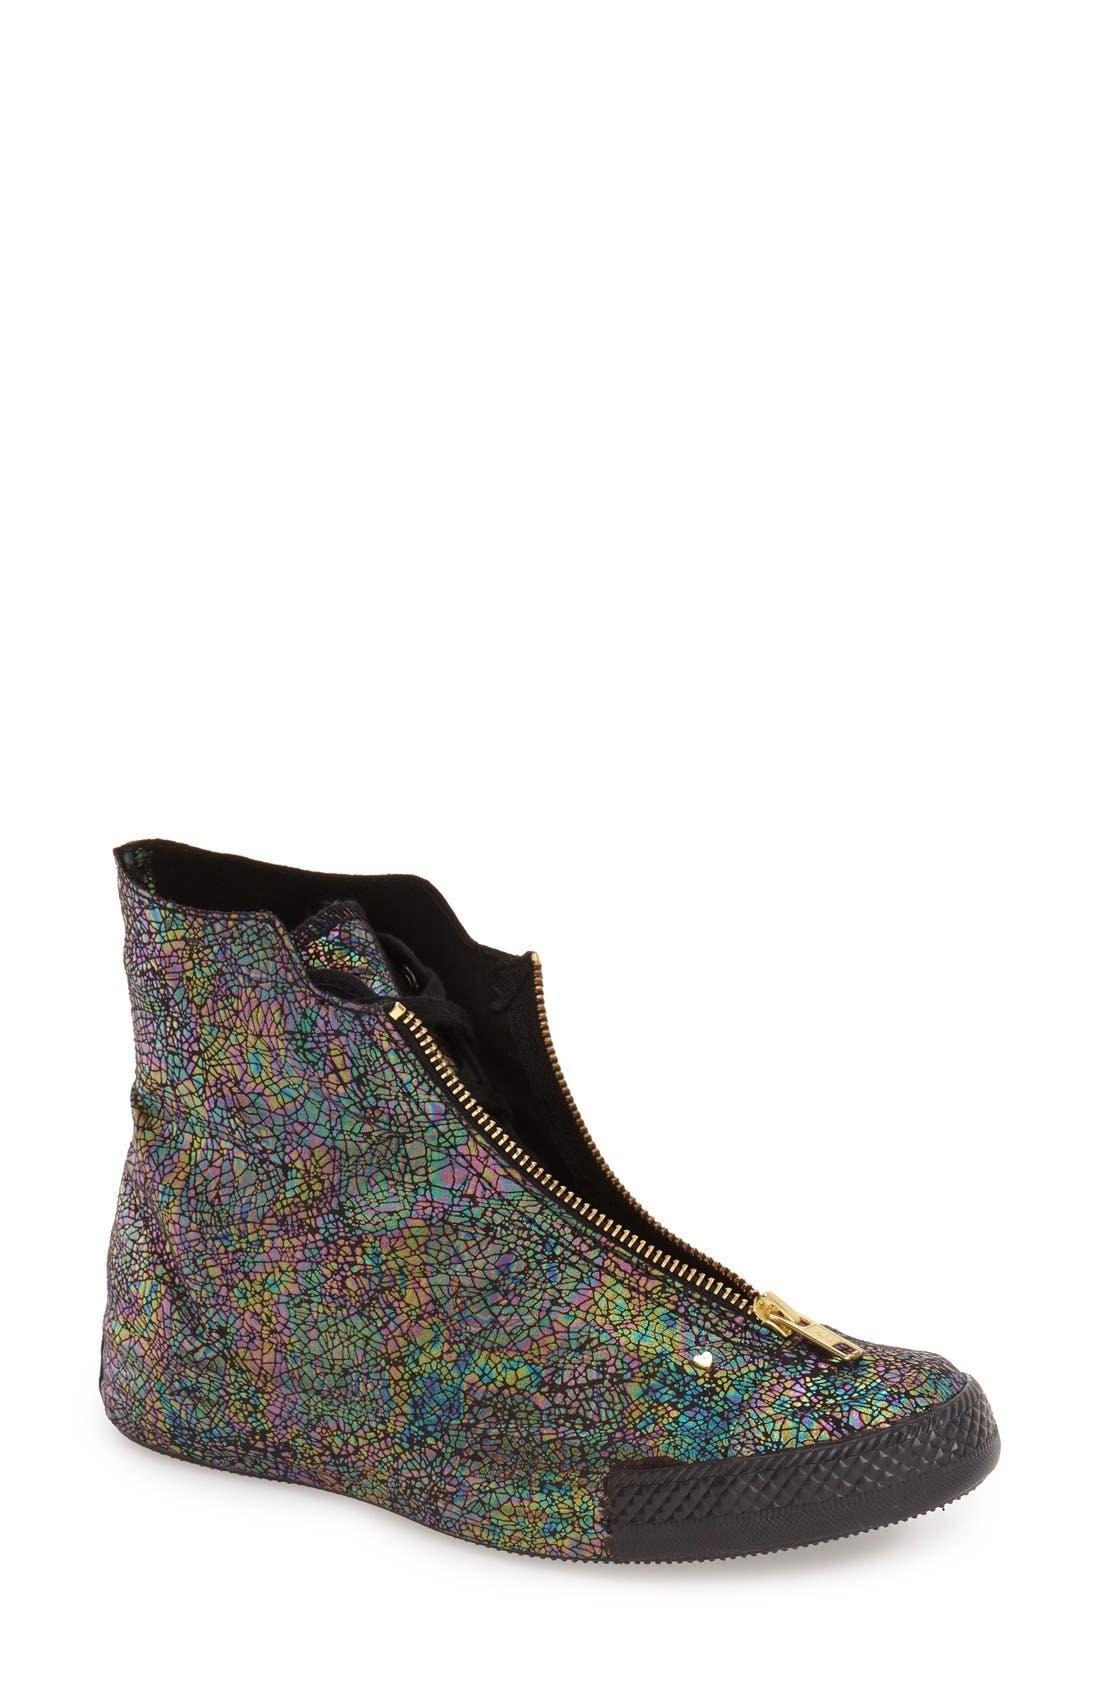 Alternate Image 1 Selected - Converse Chuck Taylor® All Star® 'Oil Slick Shroud' High Top Sneaker (Women)